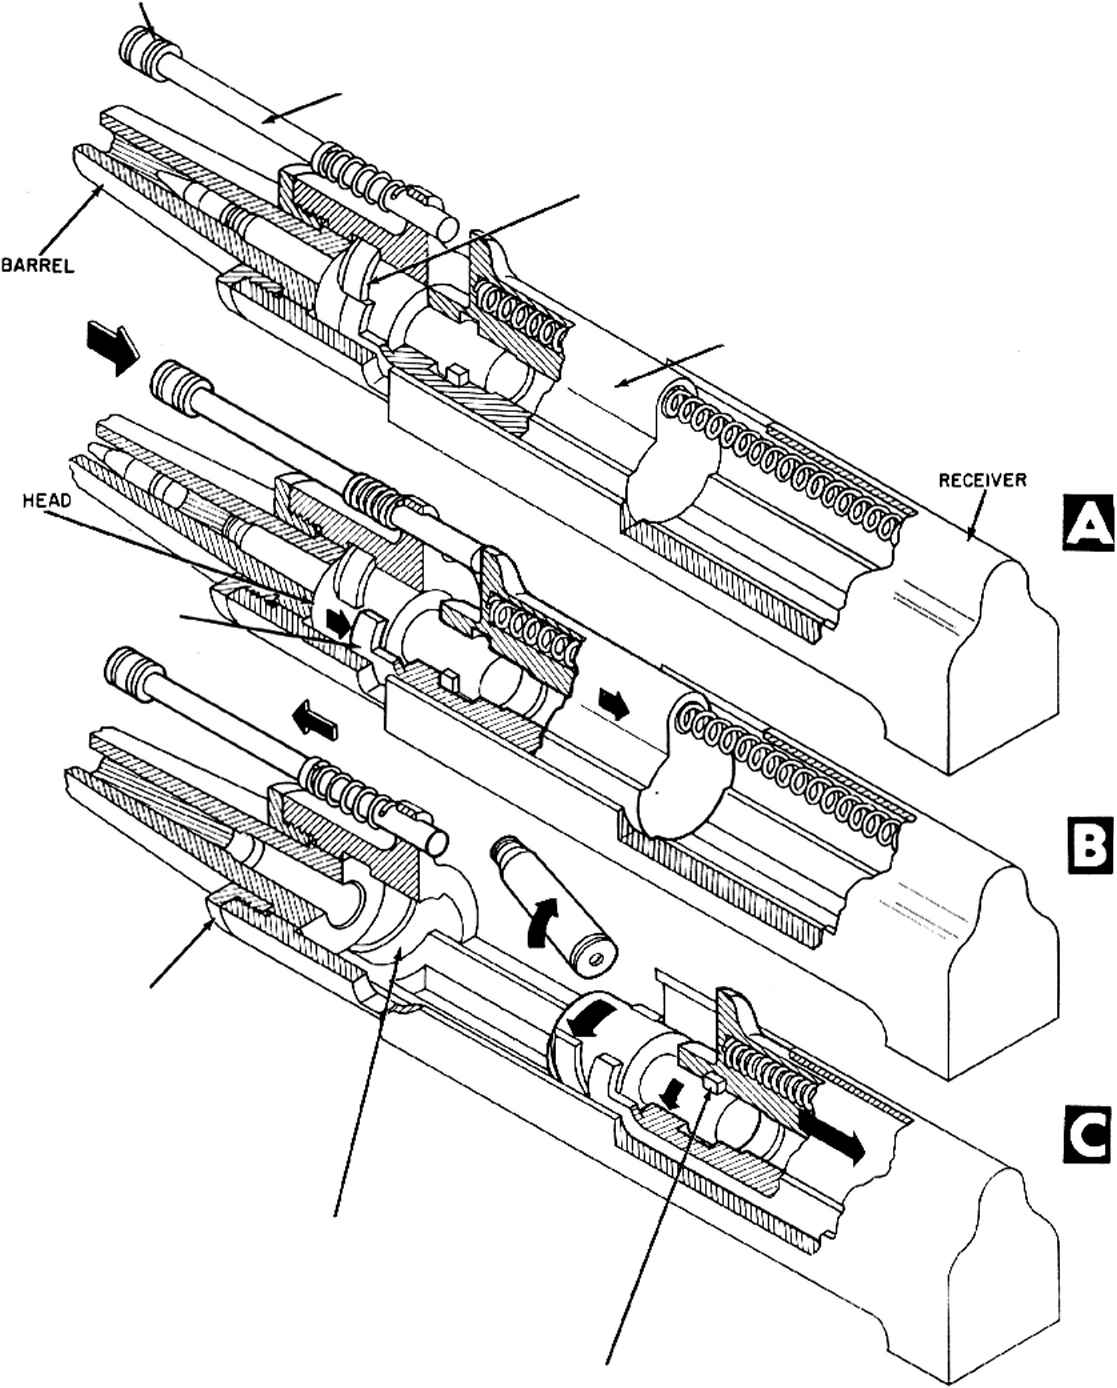 Machine Gun Bolt